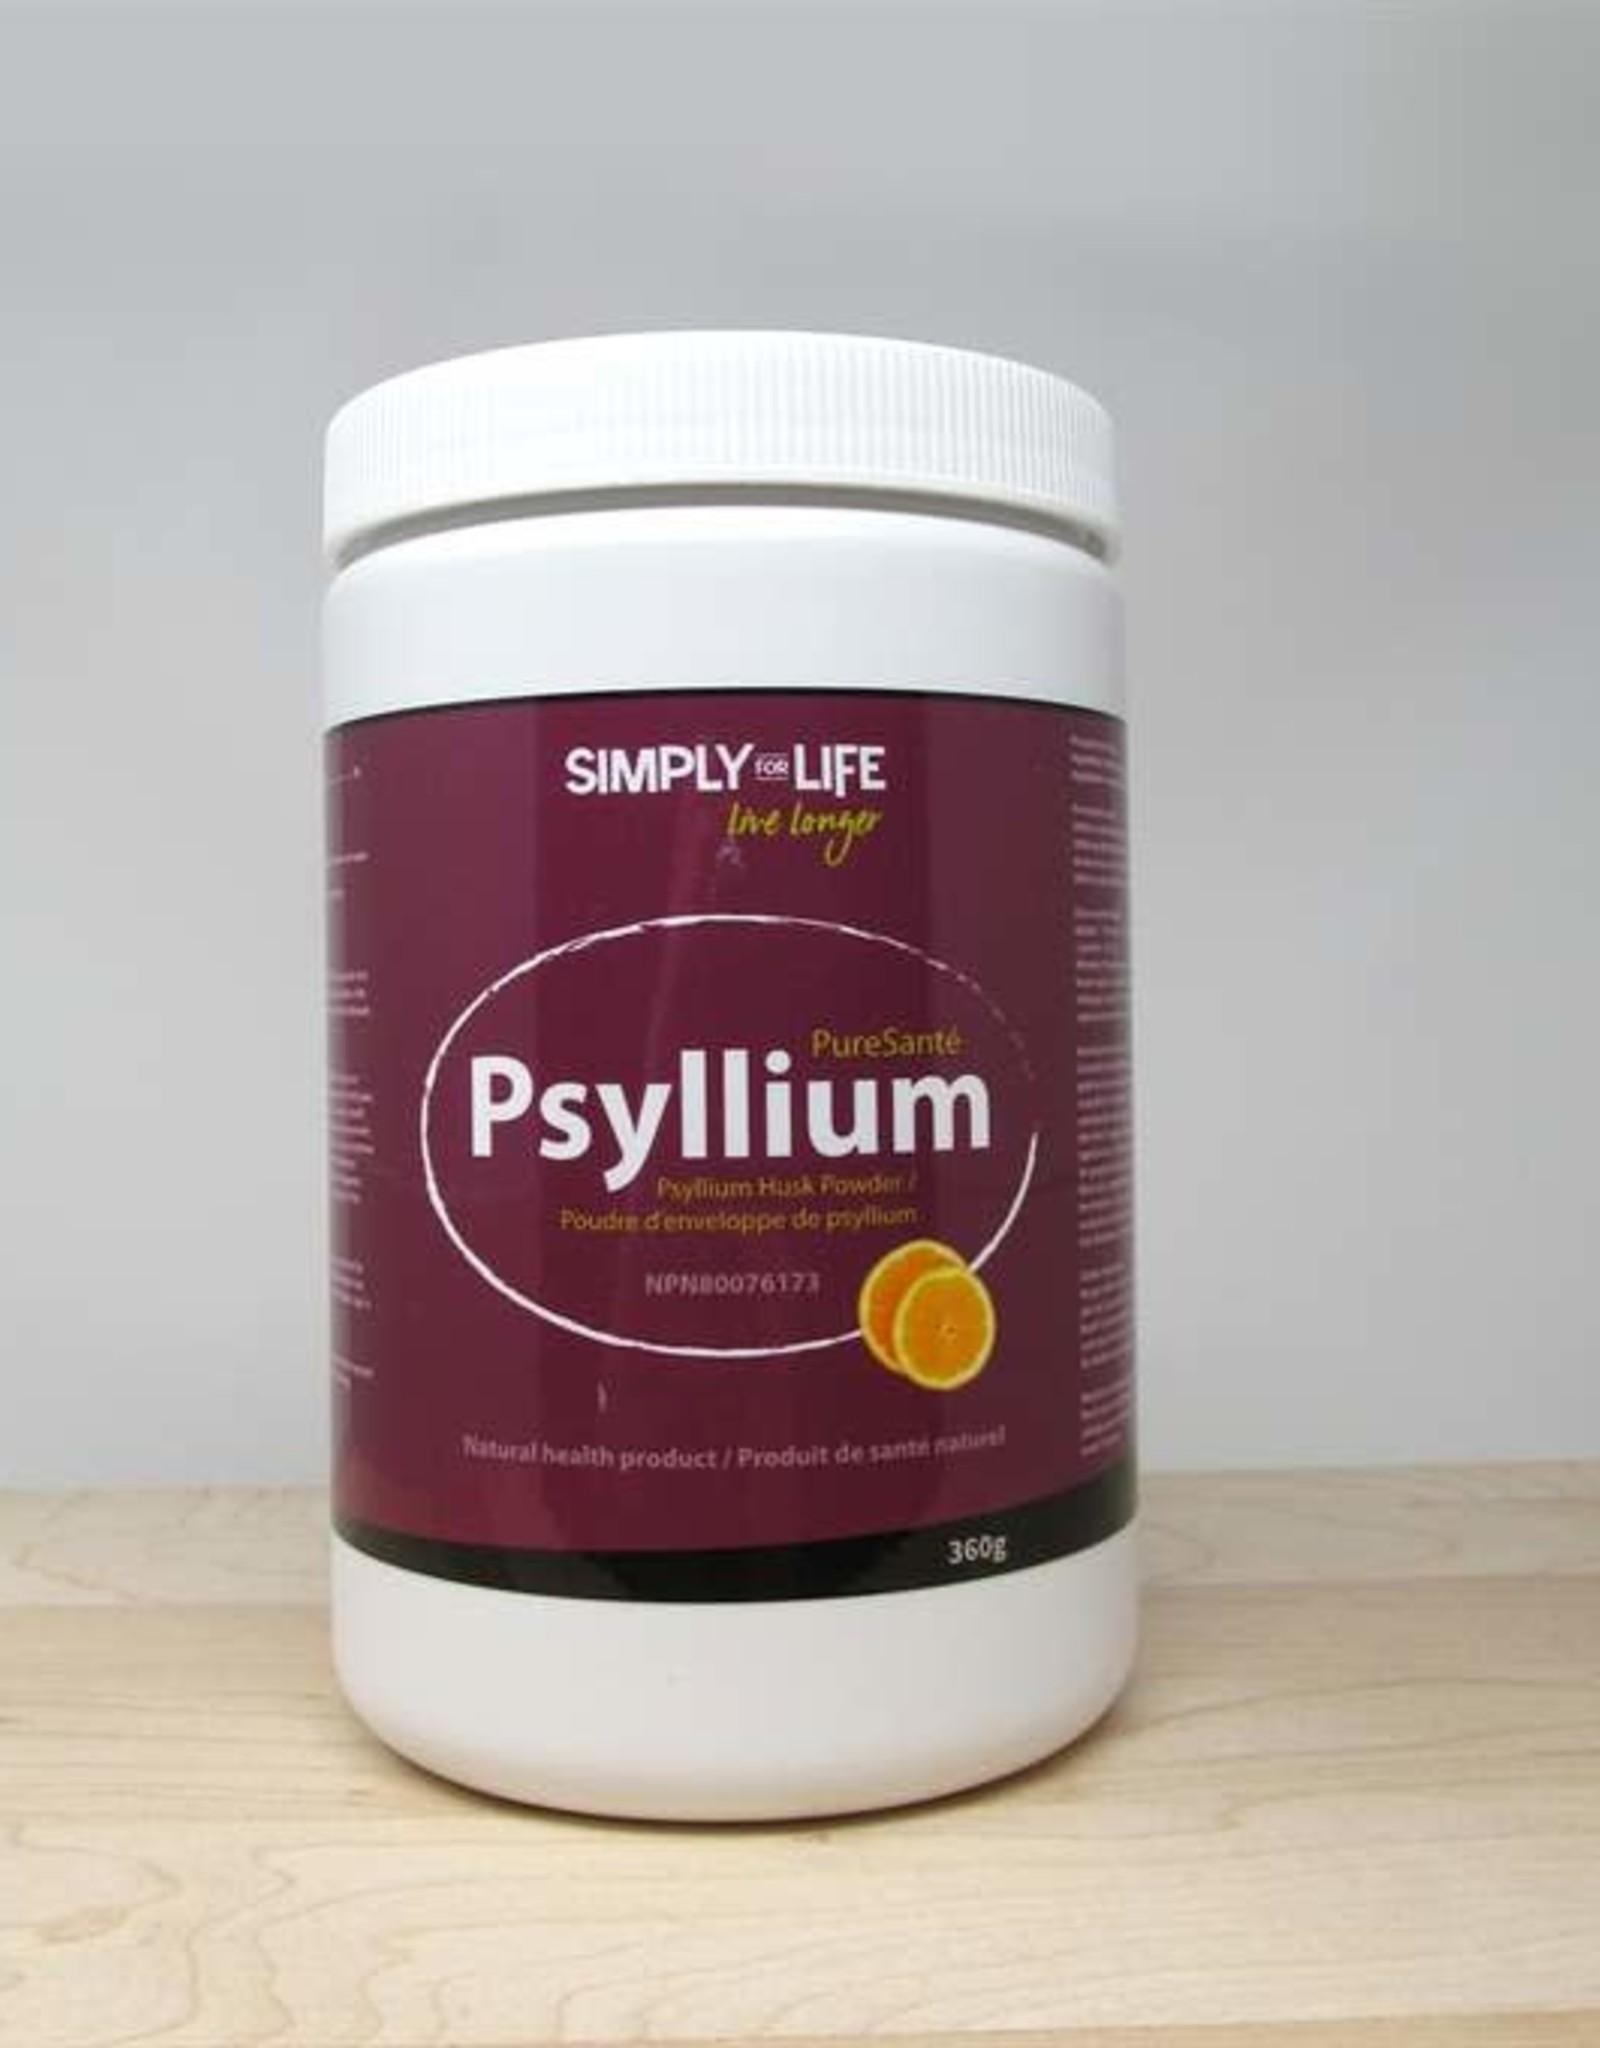 Simply For Life SFL - Psyllium Powder, Orange (360g)